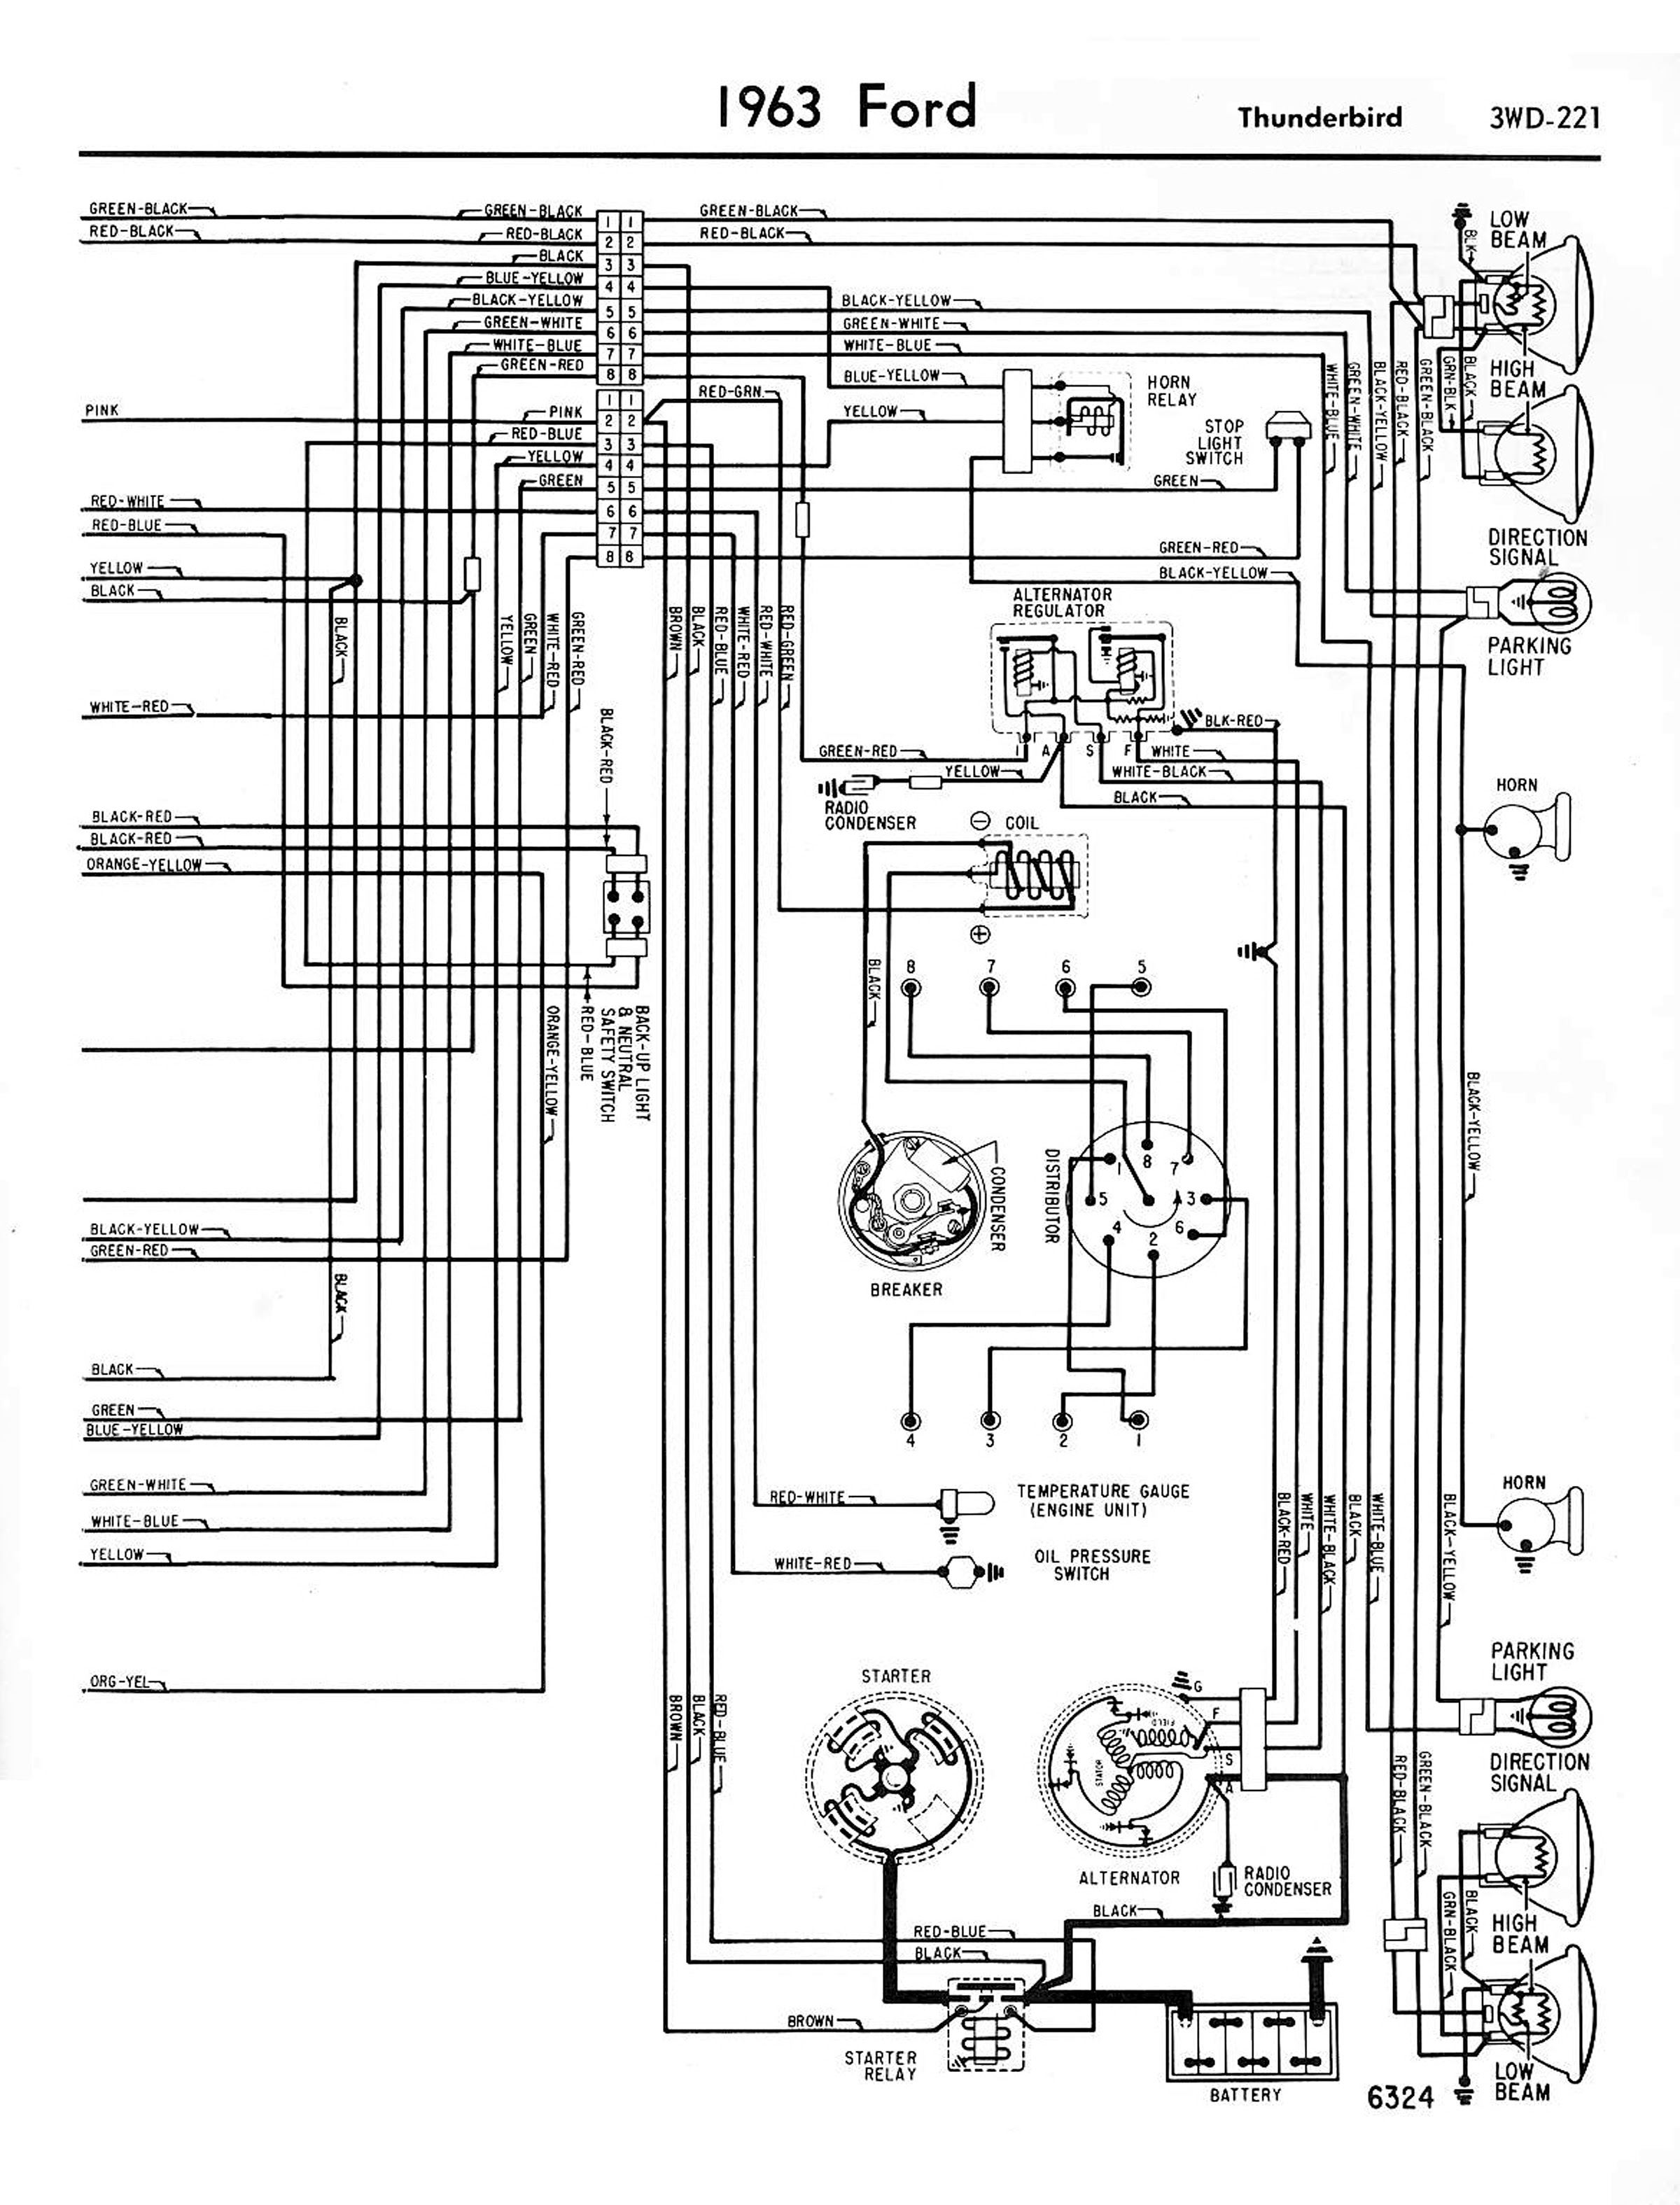 63 Fairlane Wiring Diagram